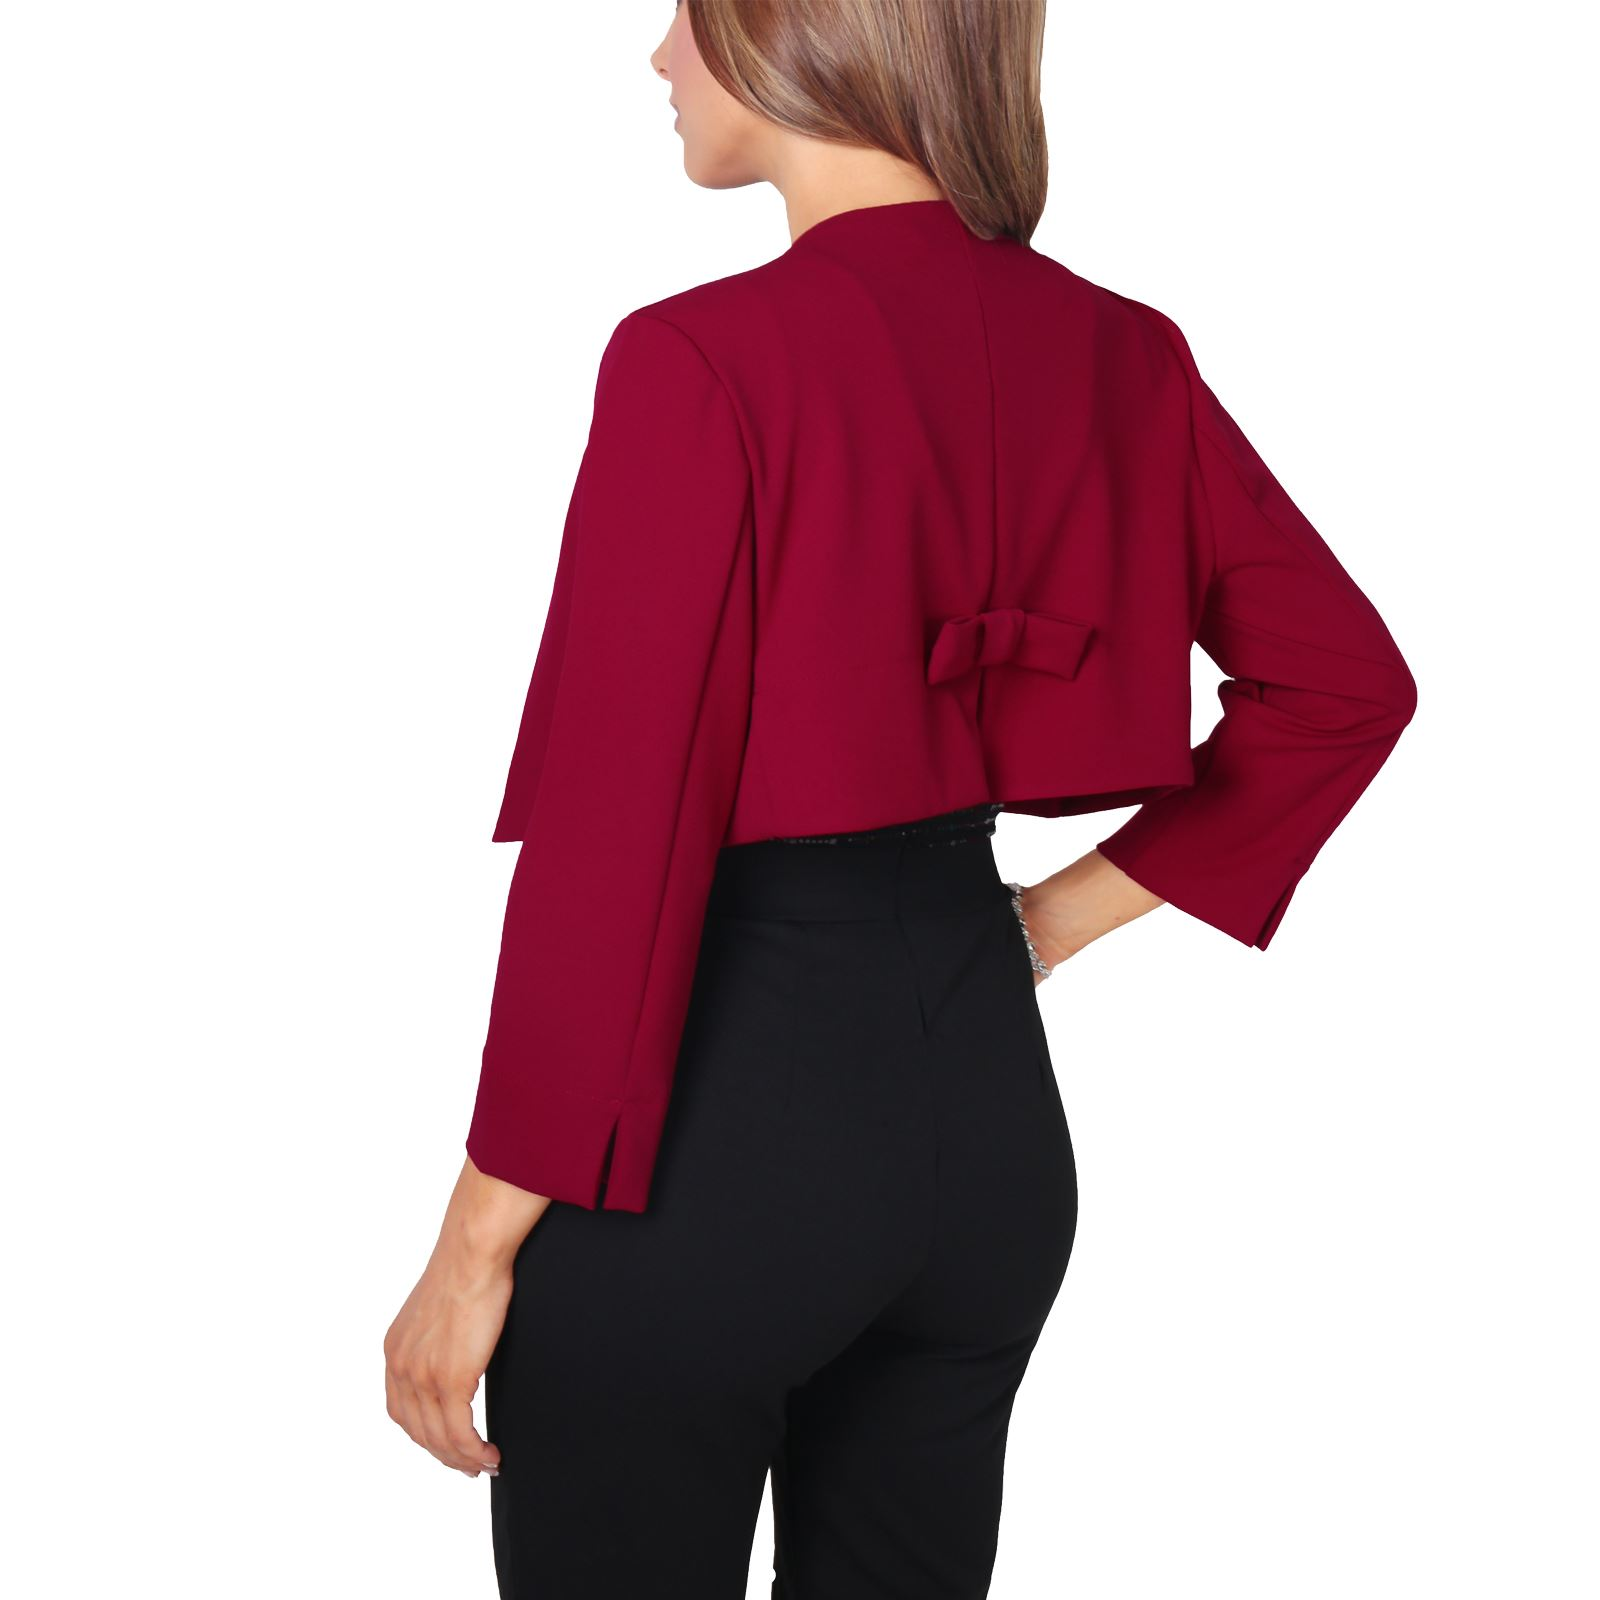 Womens-Ladies-Crop-Open-Fit-Blazer-Bow-Back-Evening-Jacket-Wedding-Bolero-Shrug